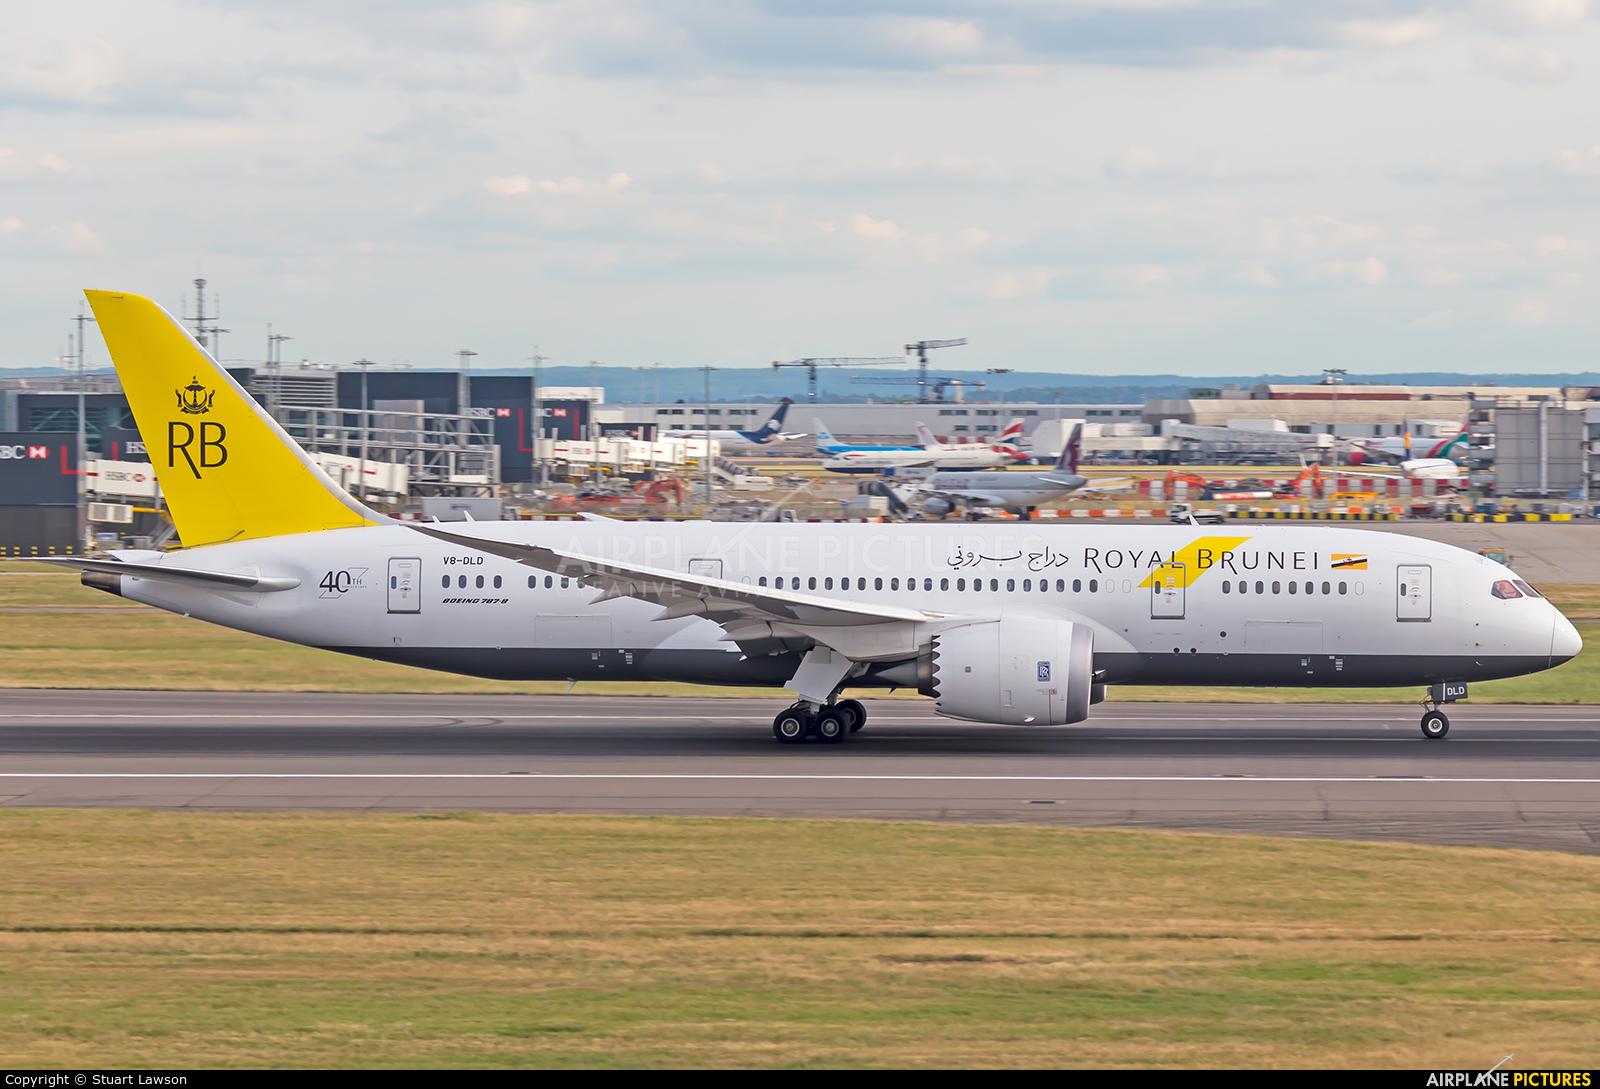 Royal Brunei Airlines V8-DLD aircraft at London - Heathrow